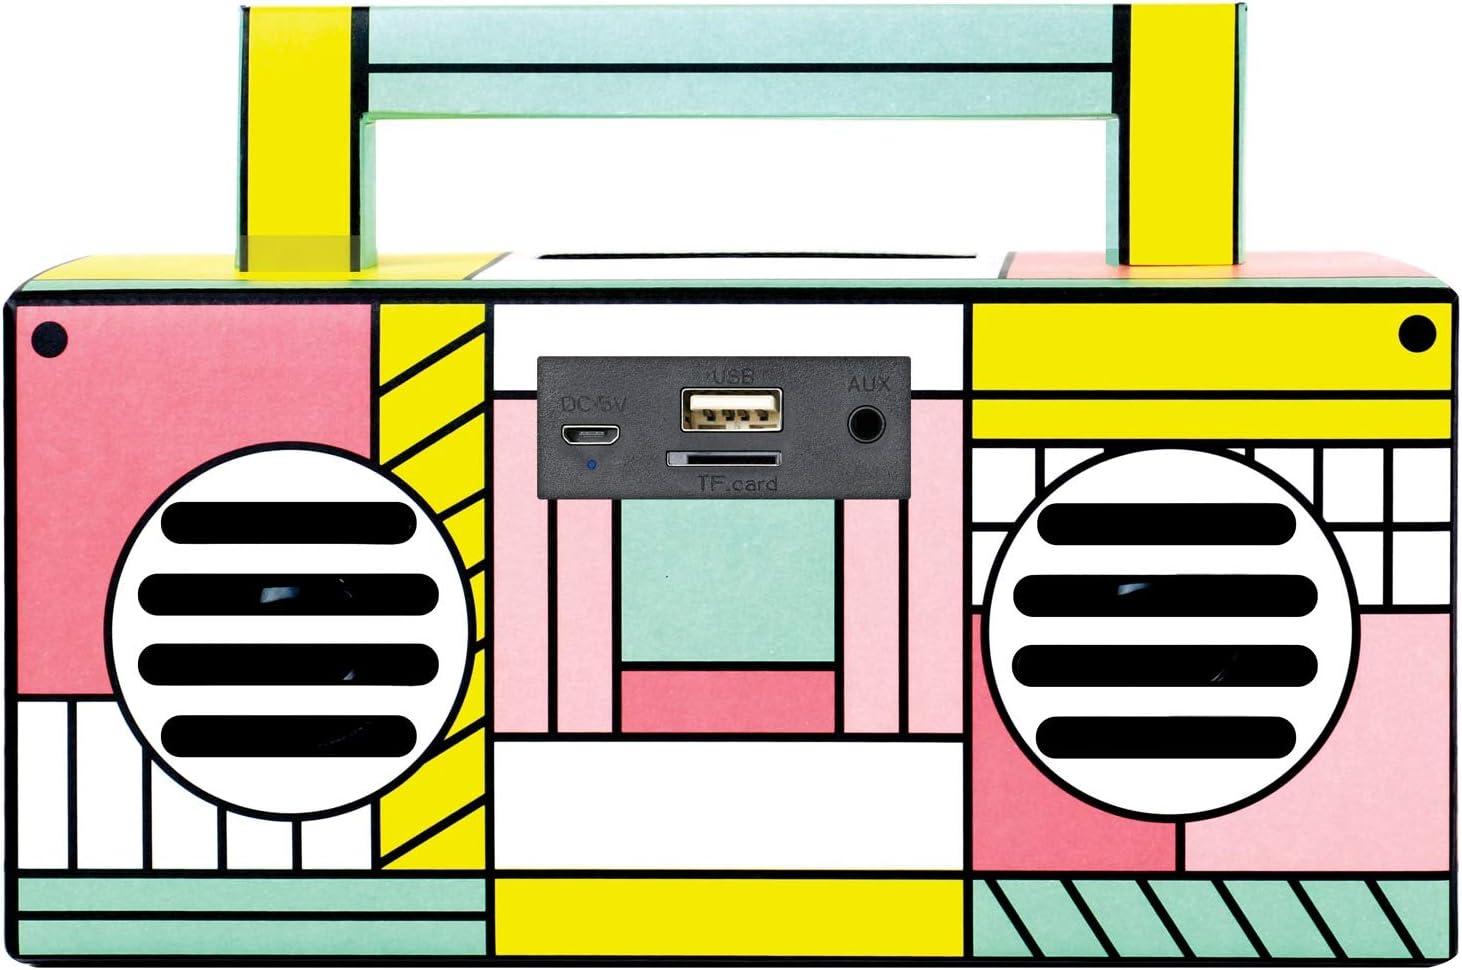 QFX BT-41-Flamingo Bluetooth Streaming TWS Ready Lightshow Speaker Pink Flamingo